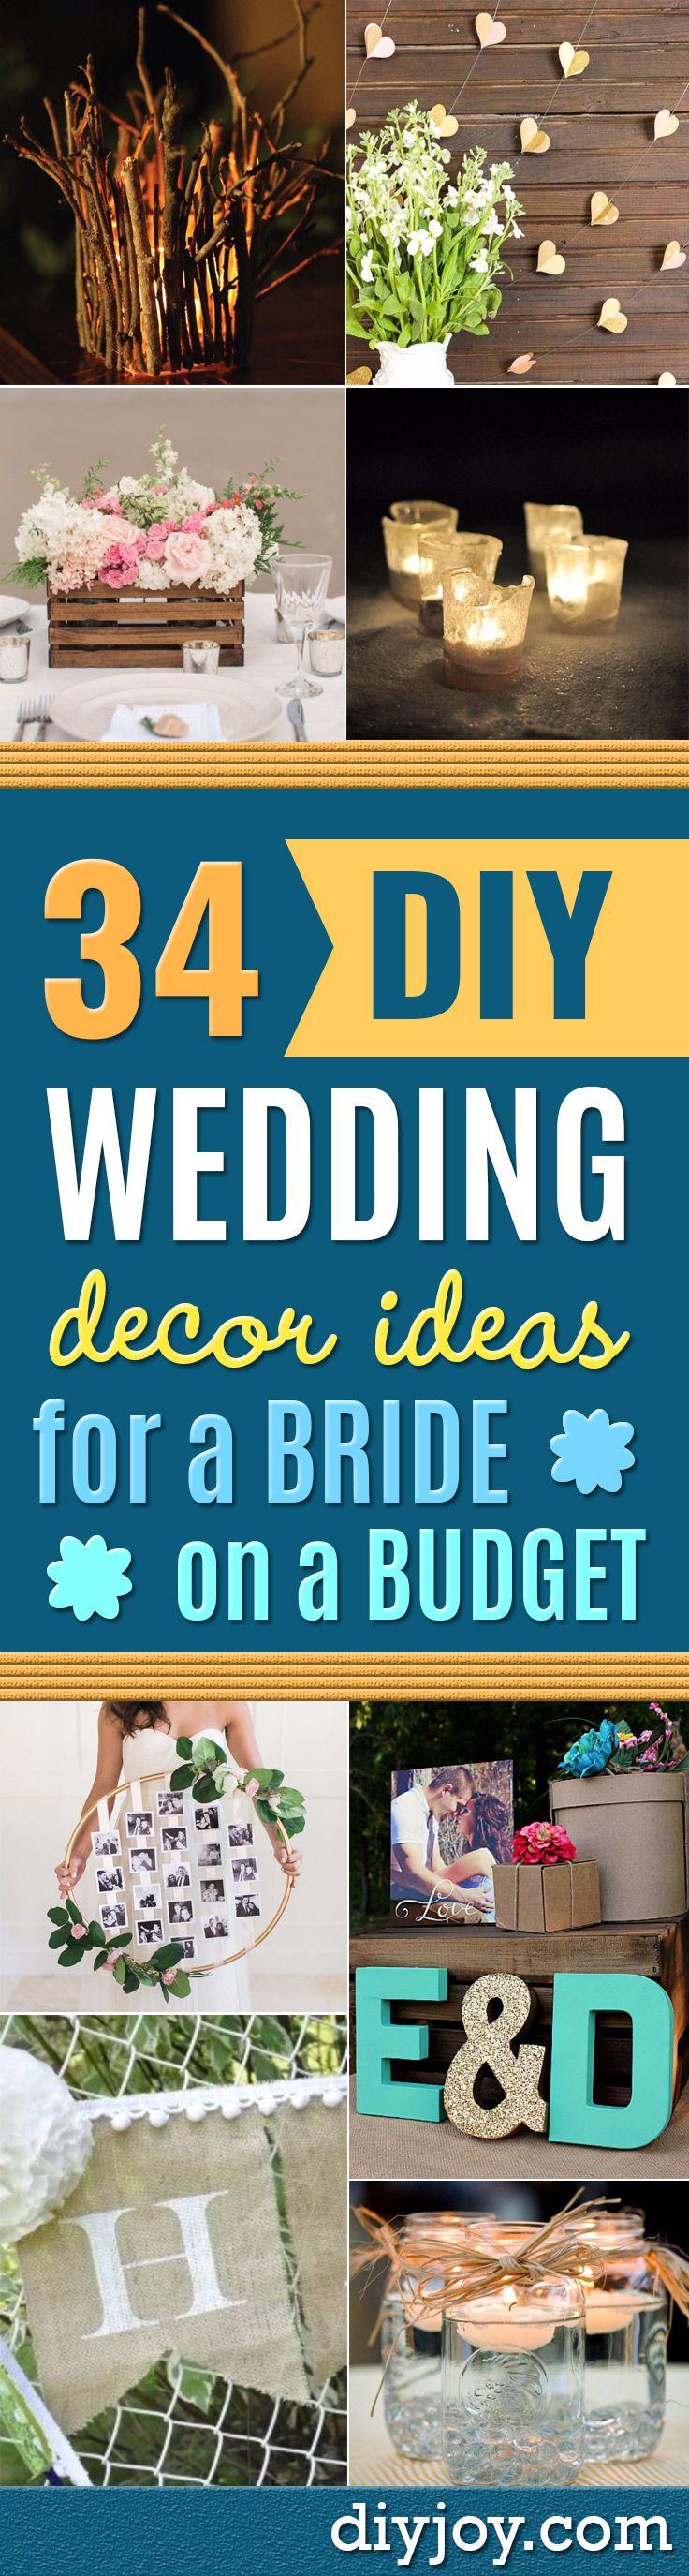 diy wedding decor ideas for the bride on a budget vintage paper